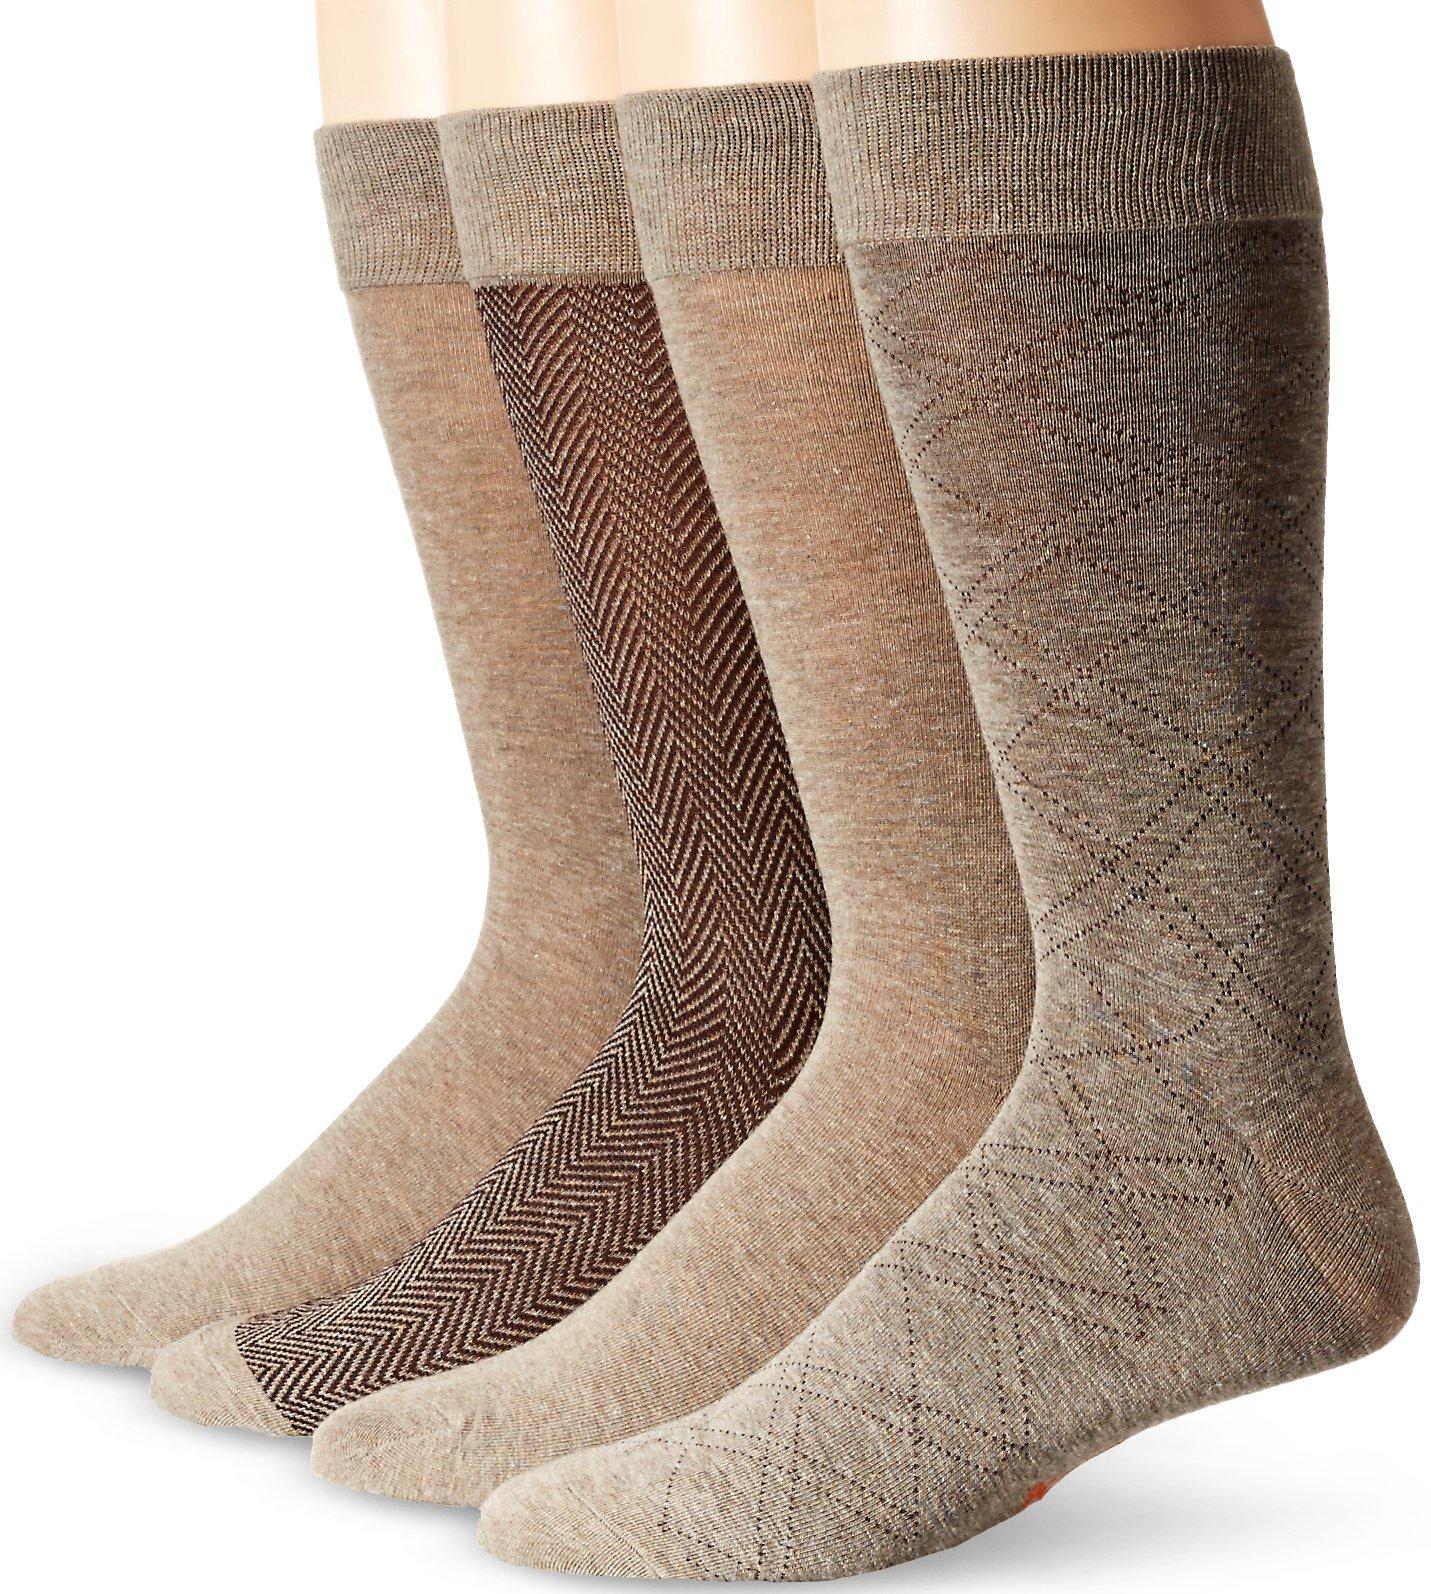 Dockers Men's 4 Pack Herringbone Dress, Light Brown Heather Assorted, Sock Size:10-13/Shoe Size: 6-12